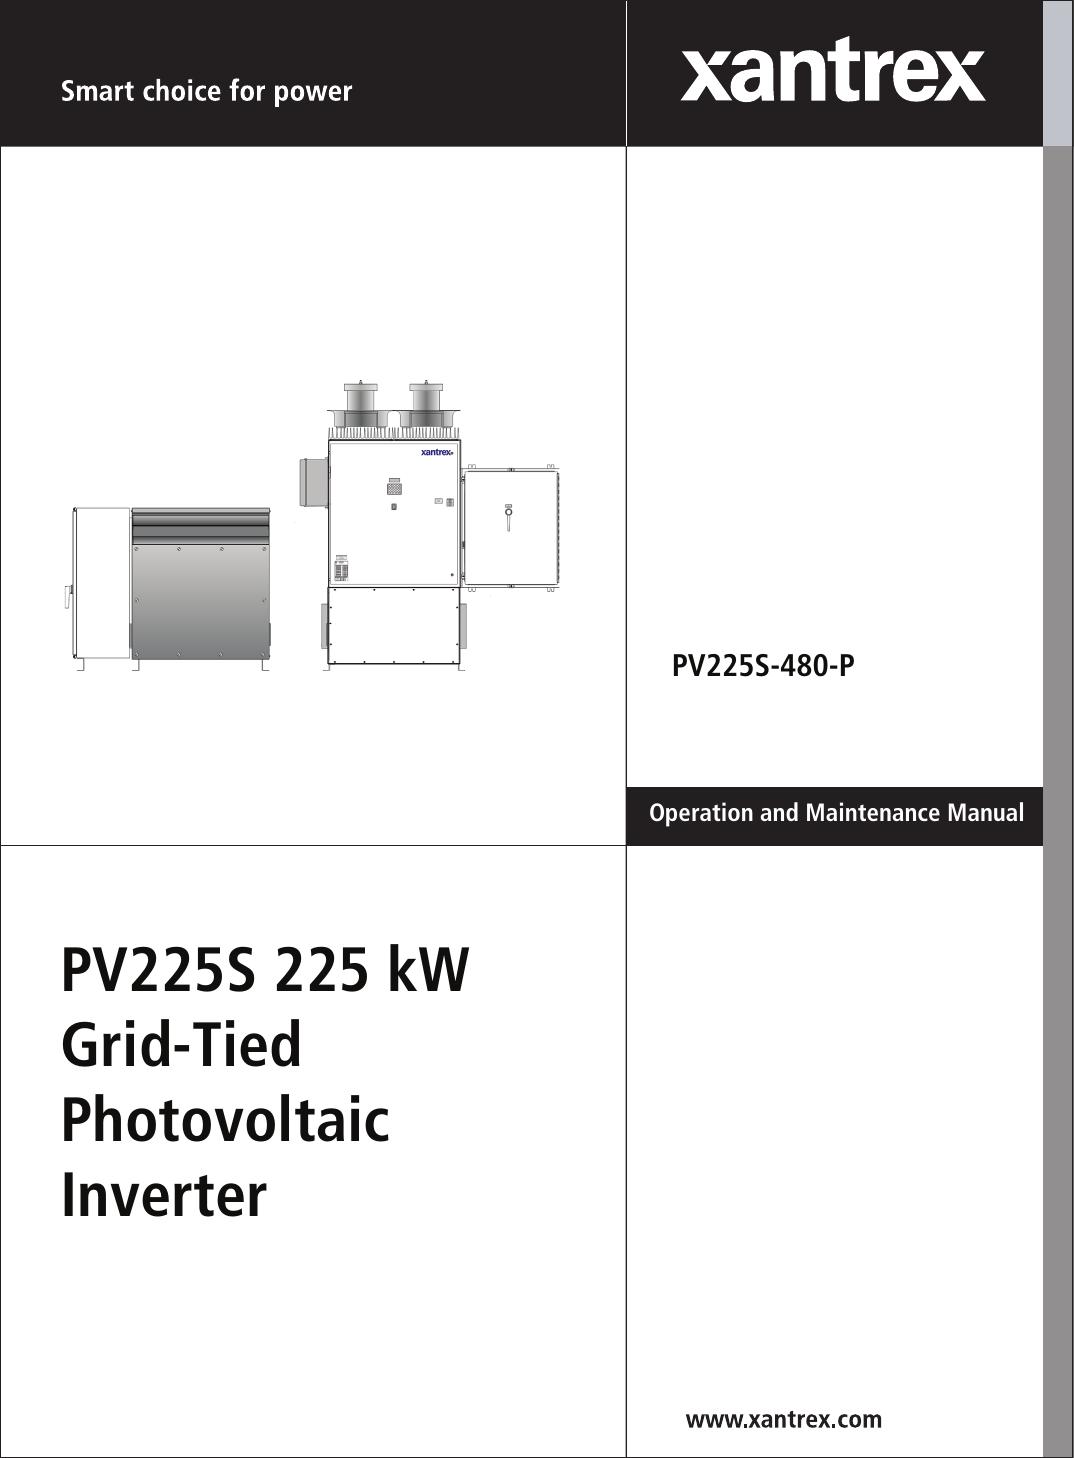 Xantrex Pv225S 480 P Users Manual 152607_rev B on